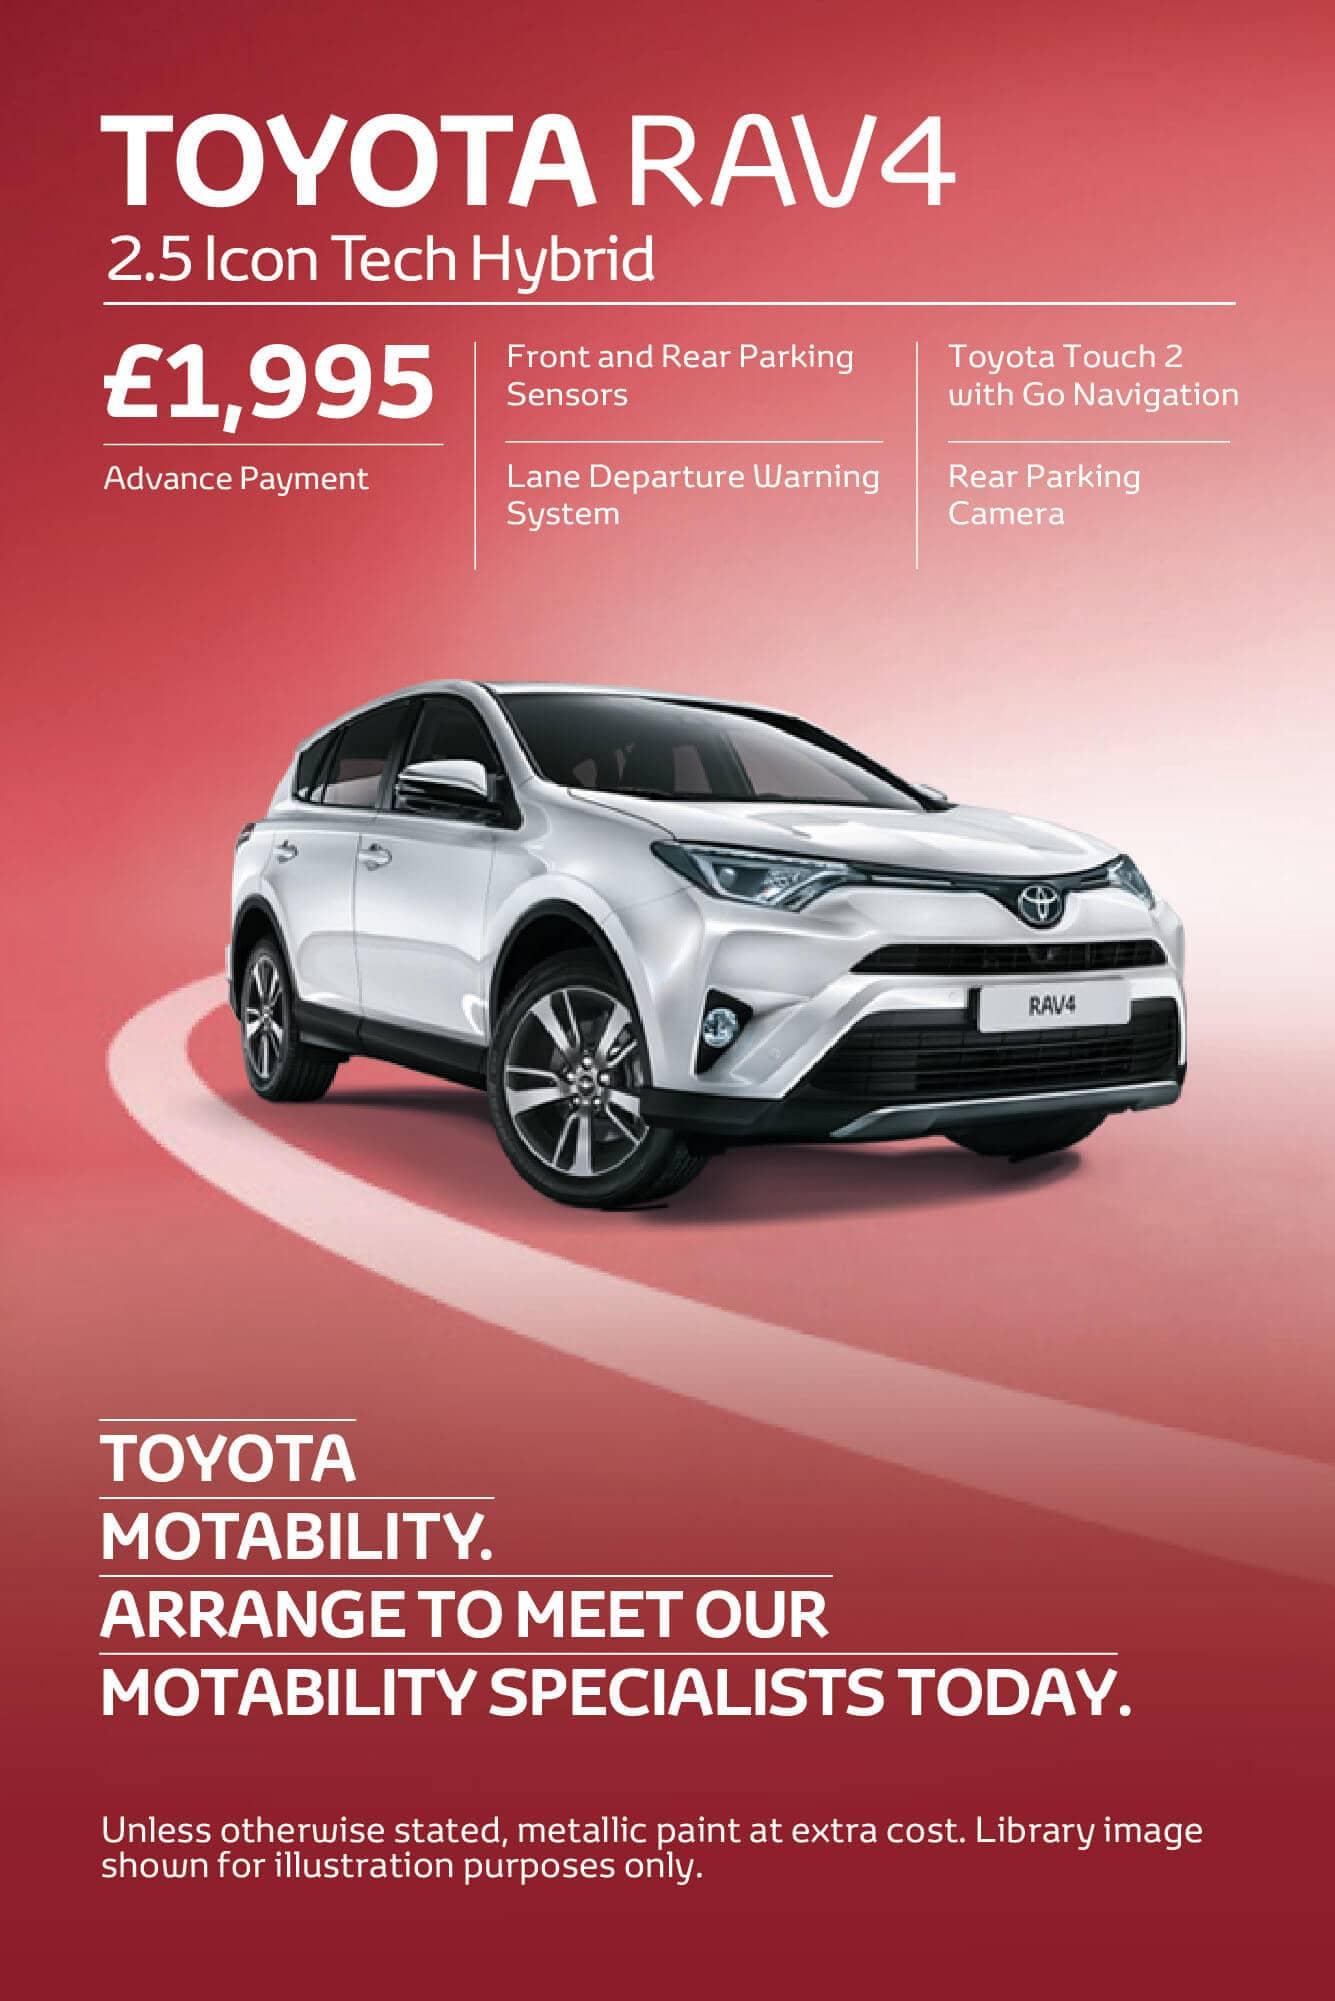 Toyota Motability Cars Toyota Motability Online Vertu